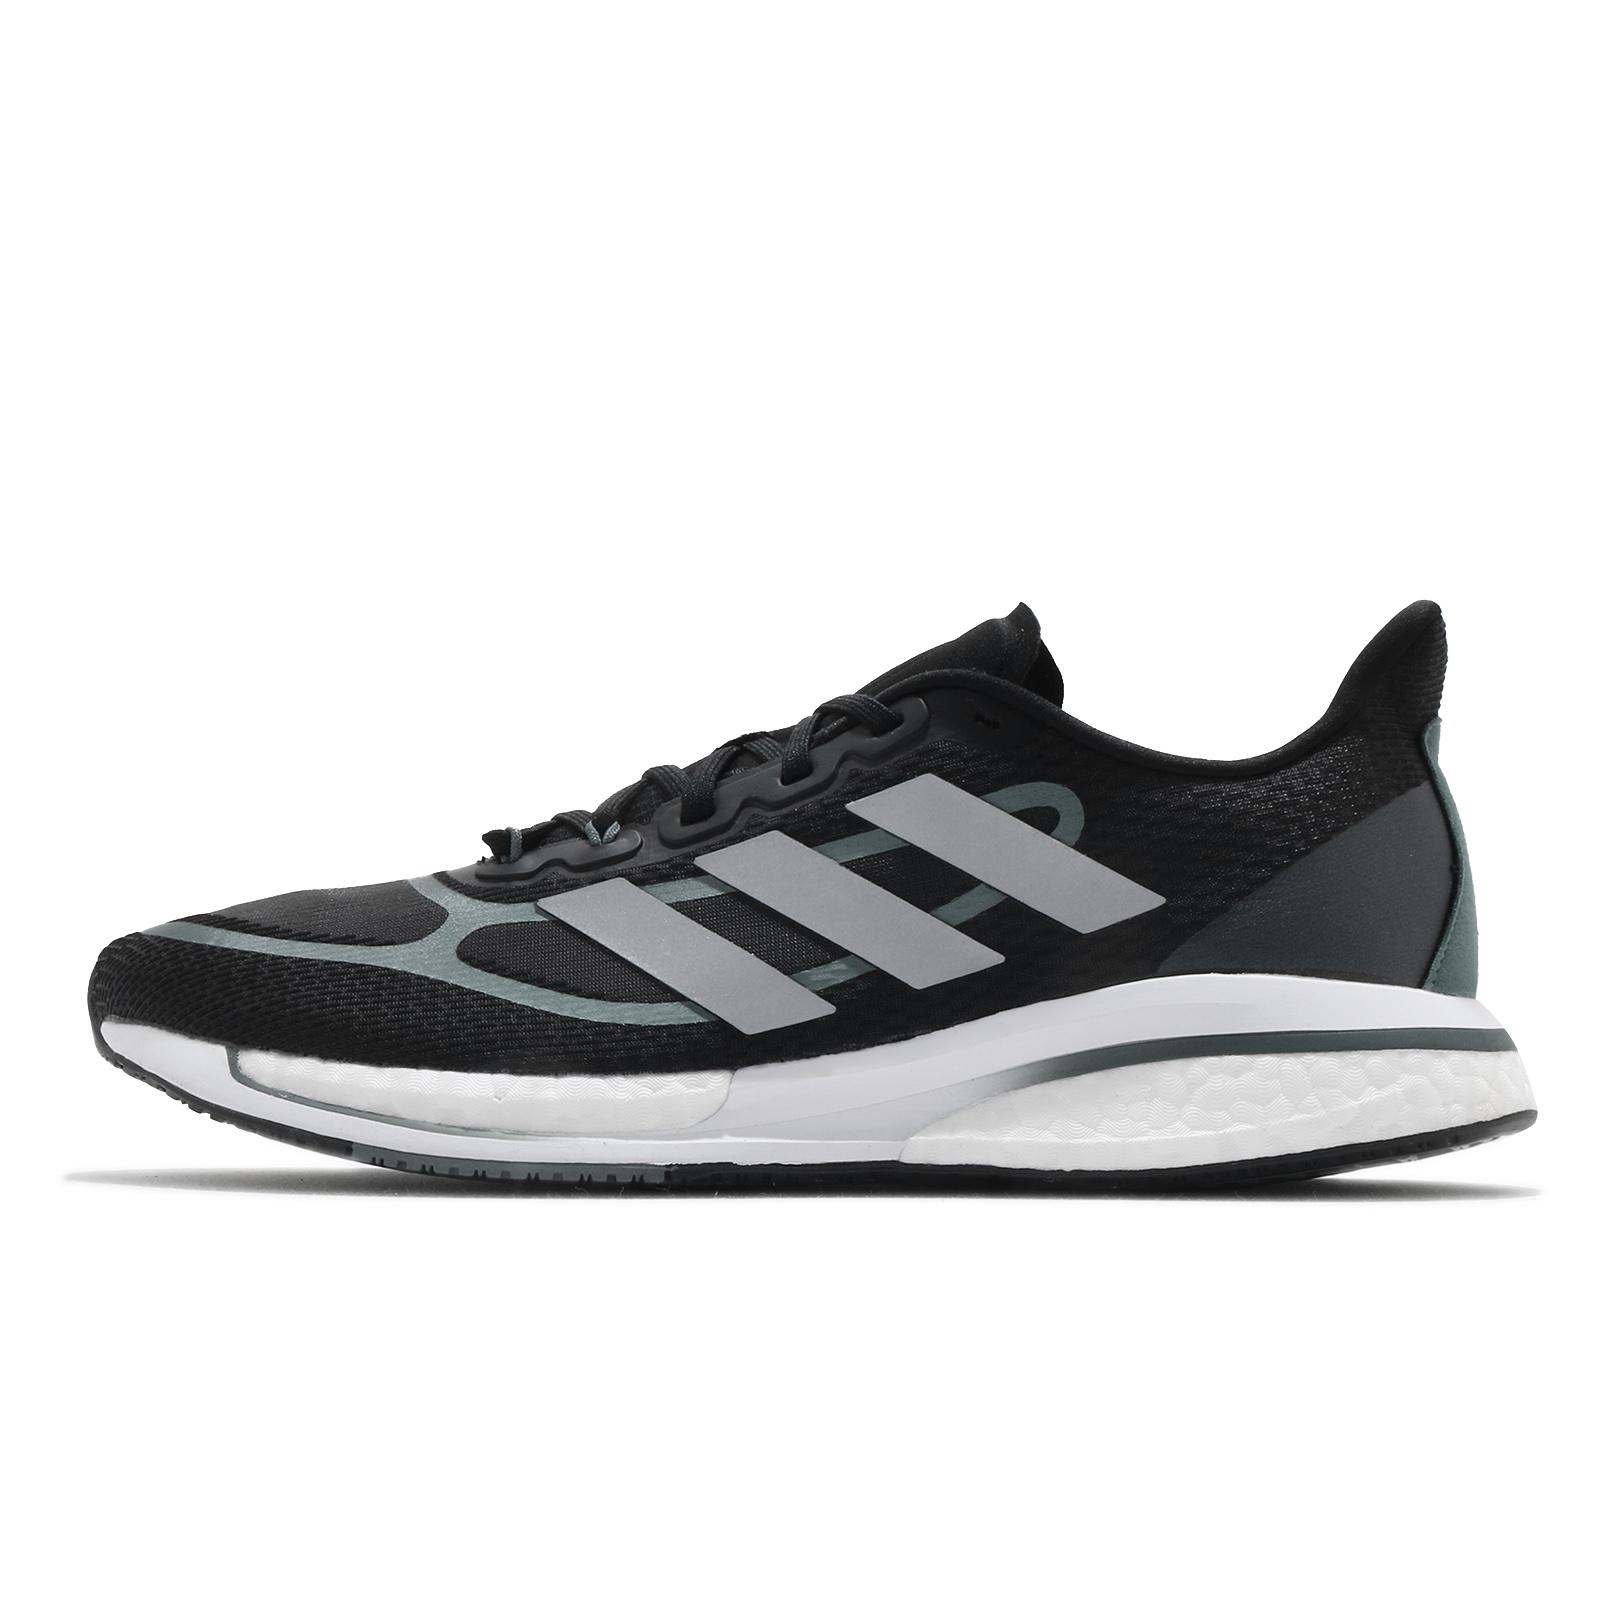 adidas 慢跑鞋 Supernova Plus M 黑 灰 路跑 愛迪達 運動鞋 男鞋【ACS】 FX6658